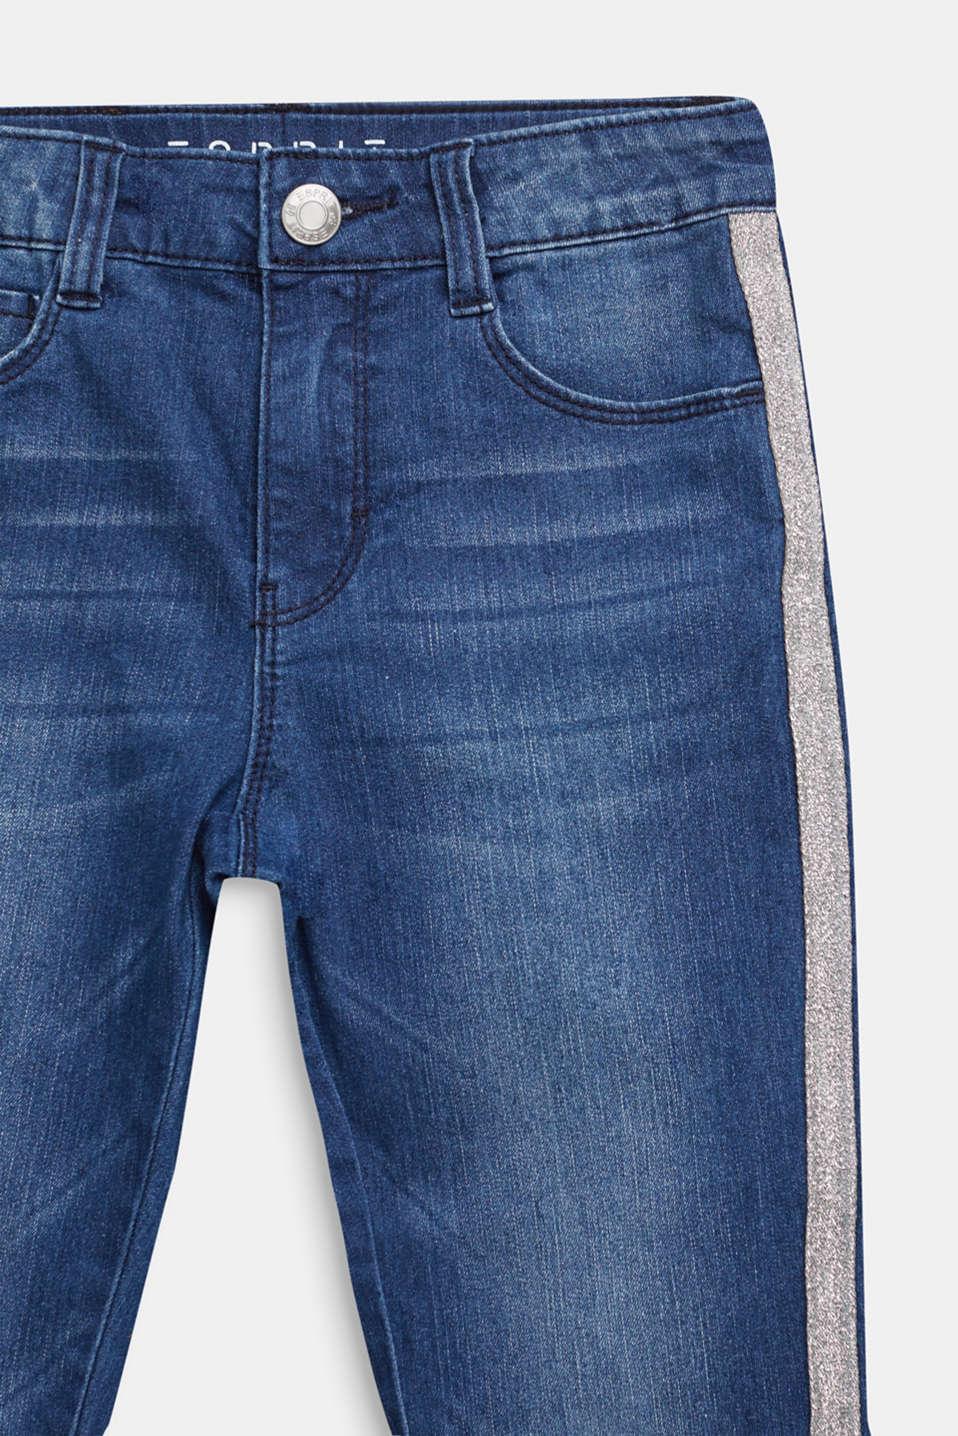 Jeans with glittering side stripes, LCDARK INDIGO DE, detail image number 2